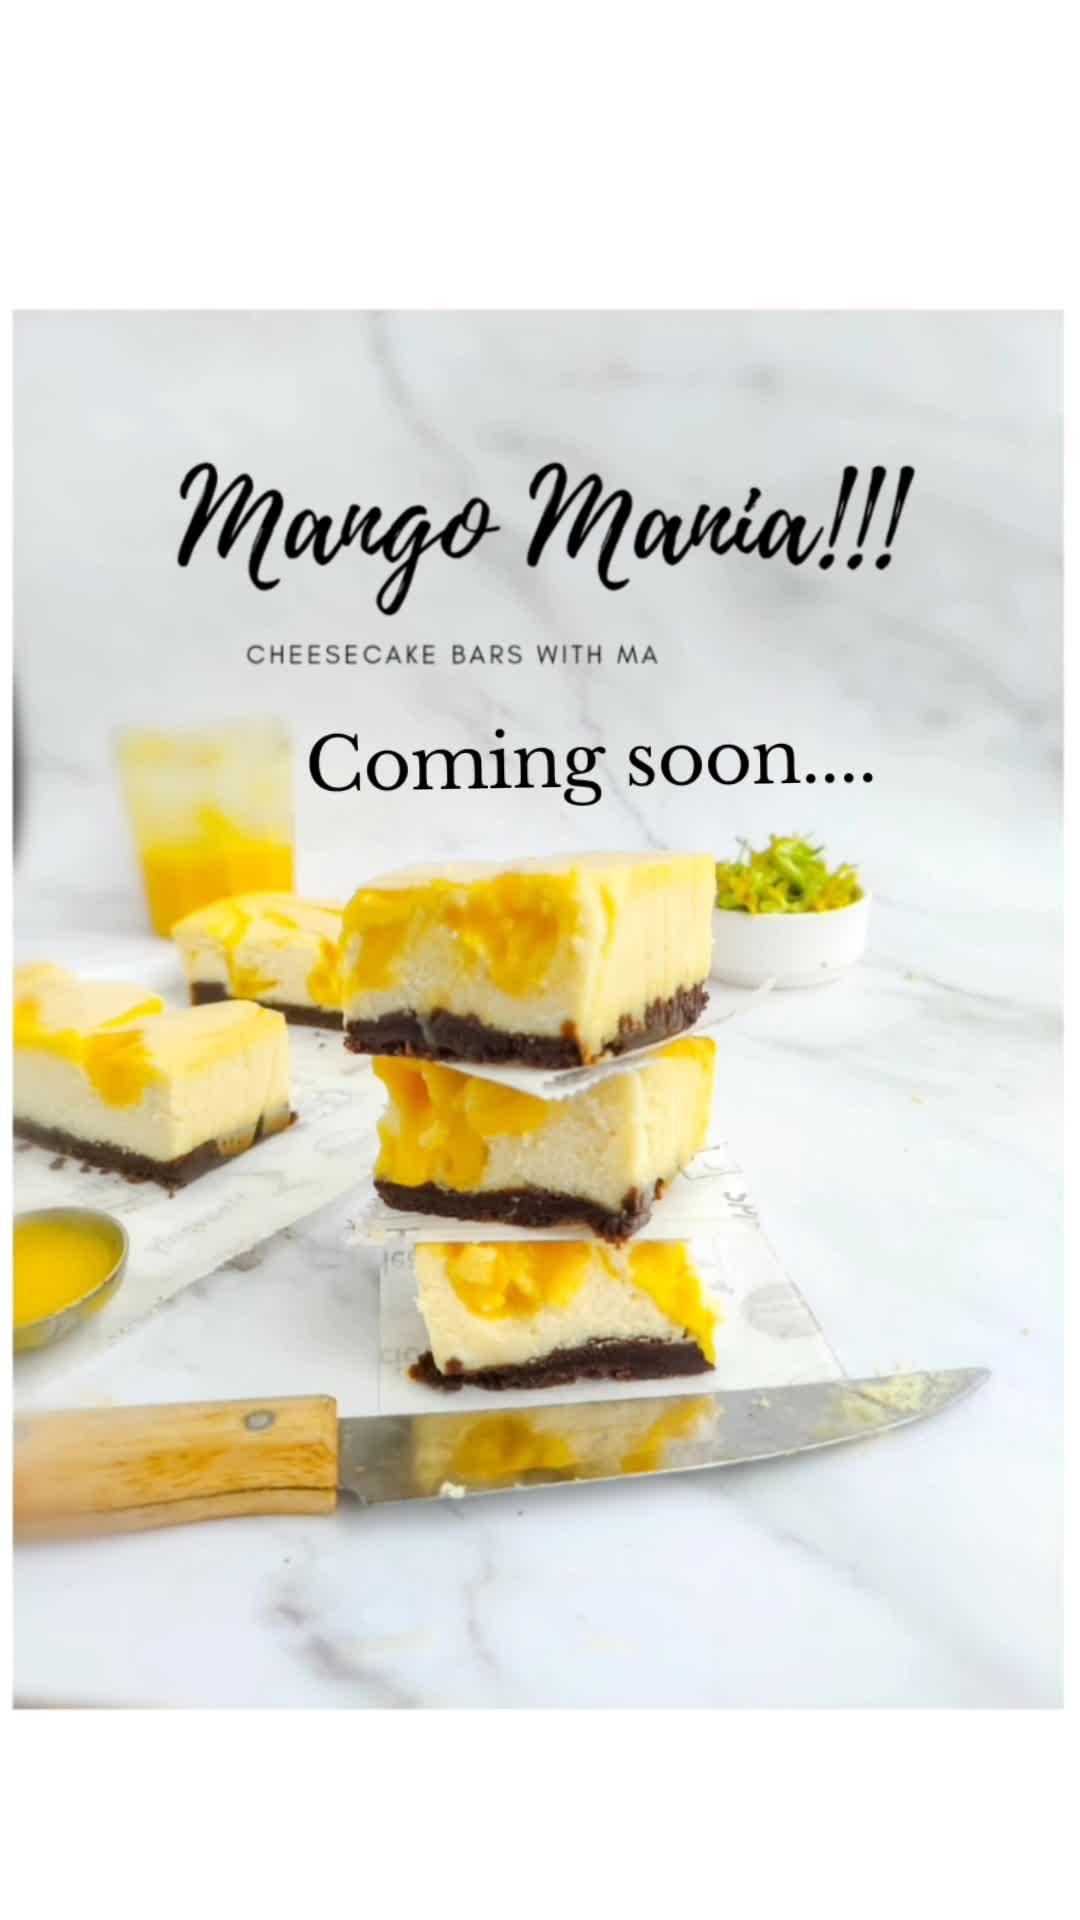 Coming soon....